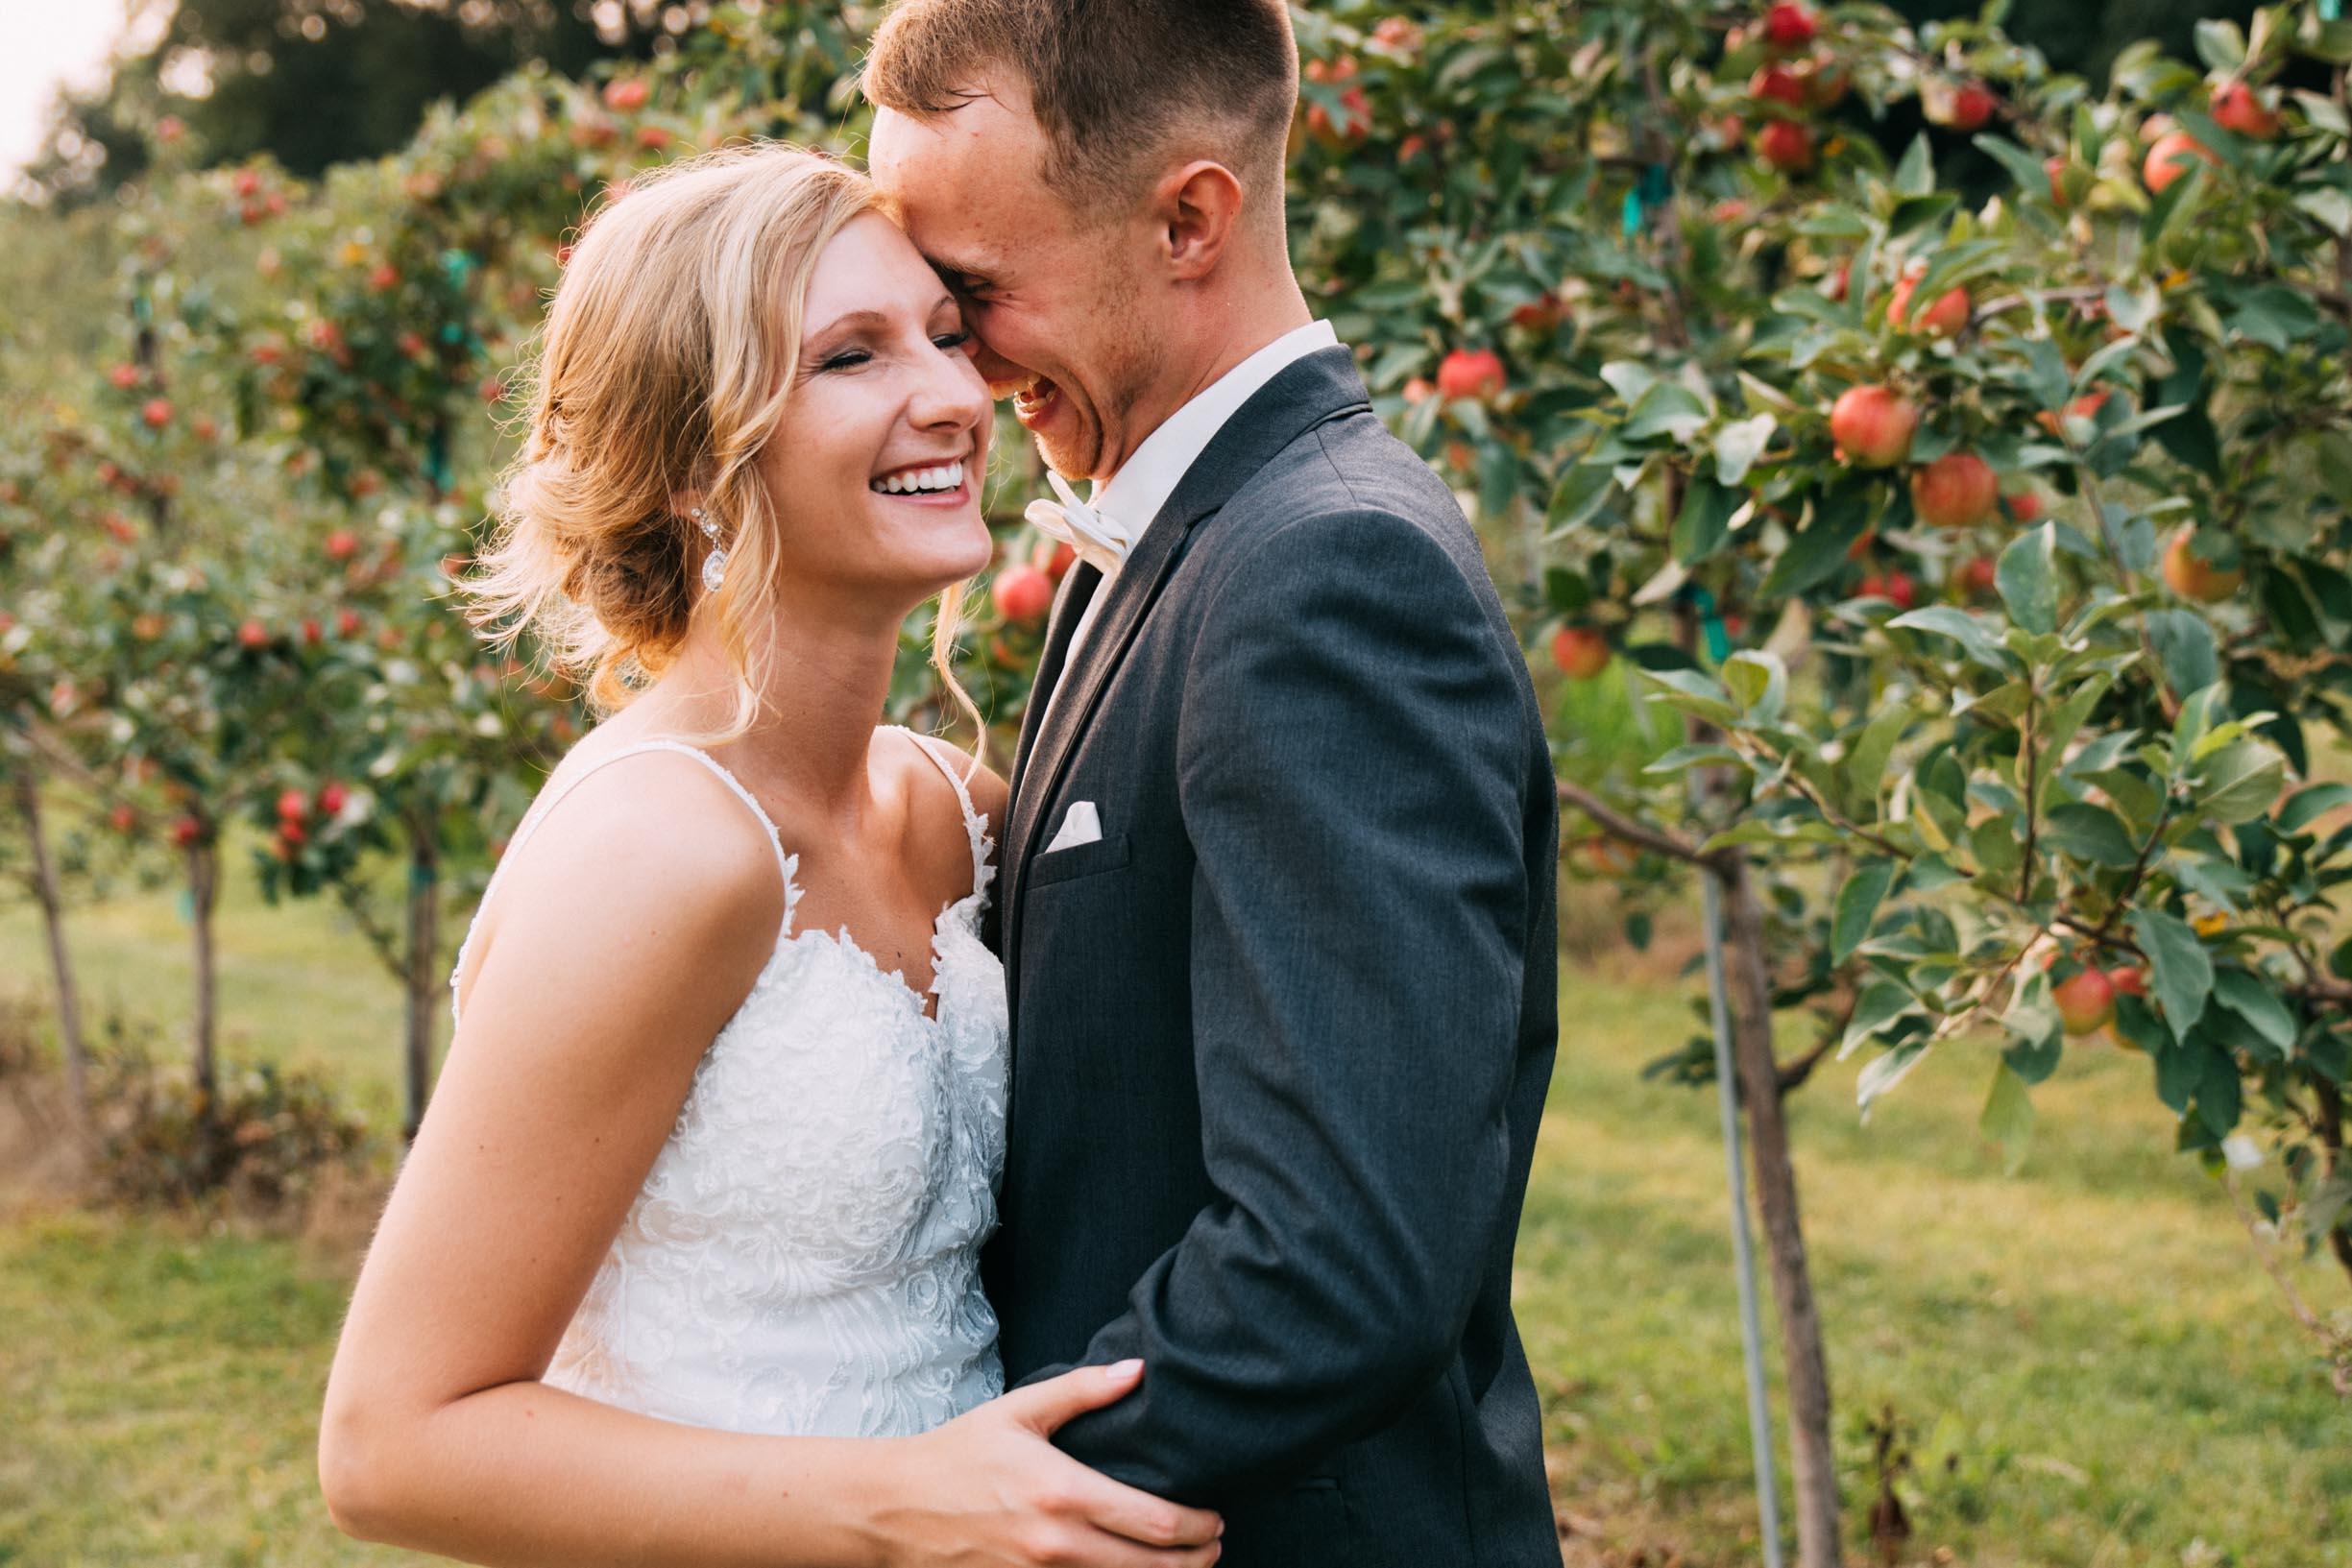 34-Minnetonka Orchards Wedding Ashley Bryce Blog.jpg